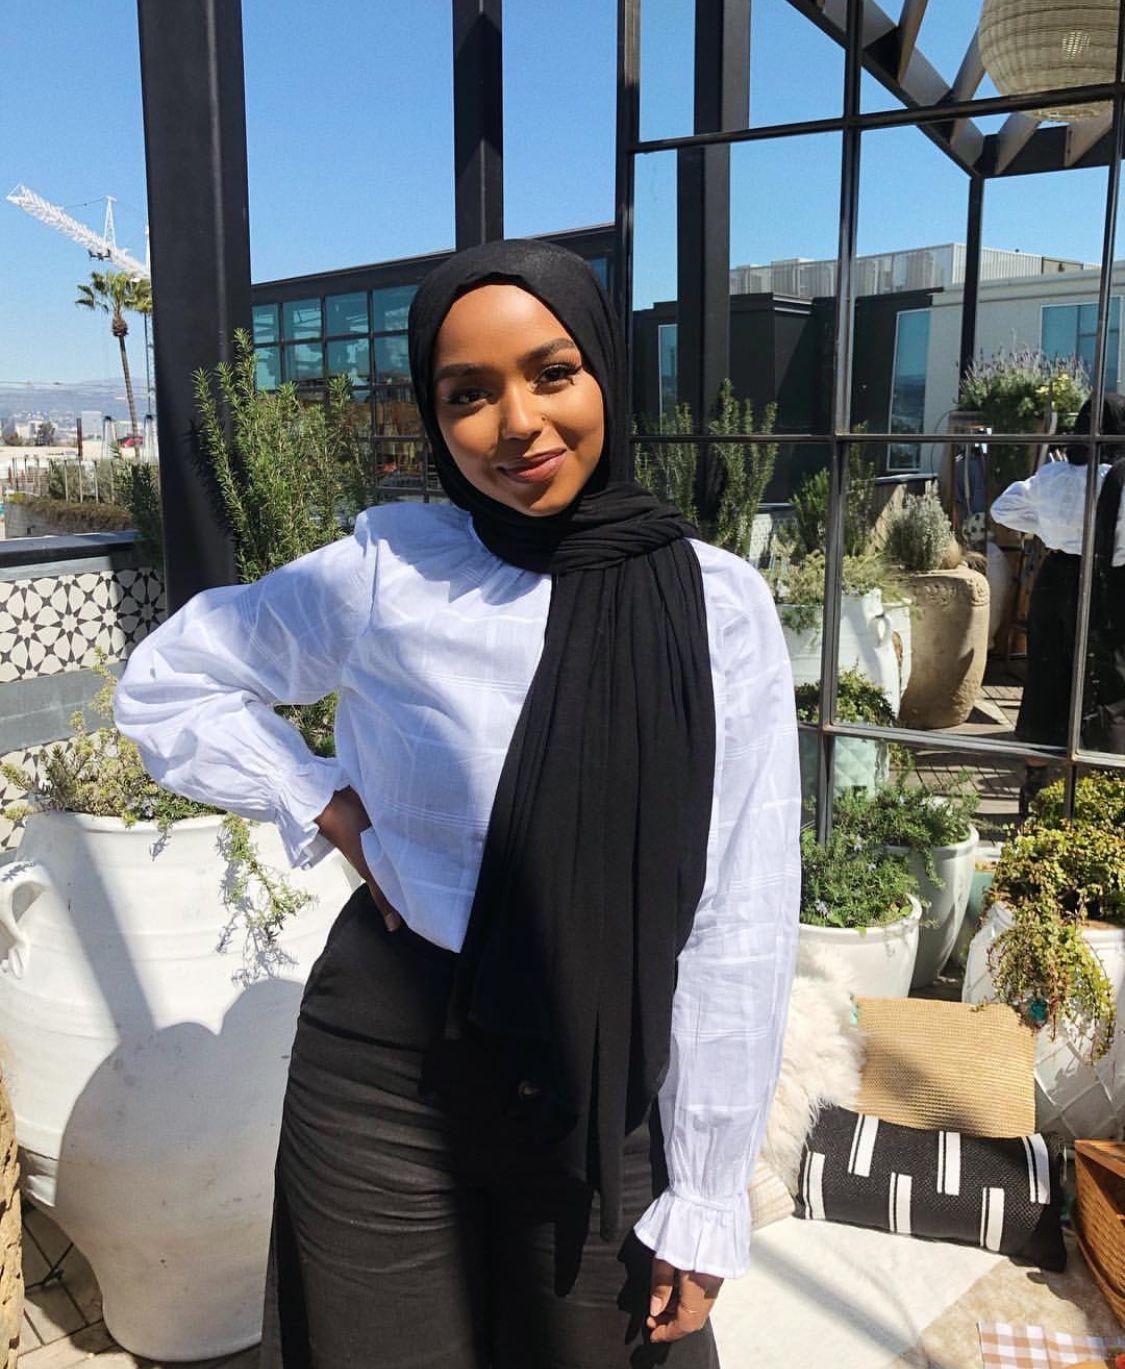 Pin by YSS on Hijabi Fashion ☼☾☆ Hijab fashion, Muslim